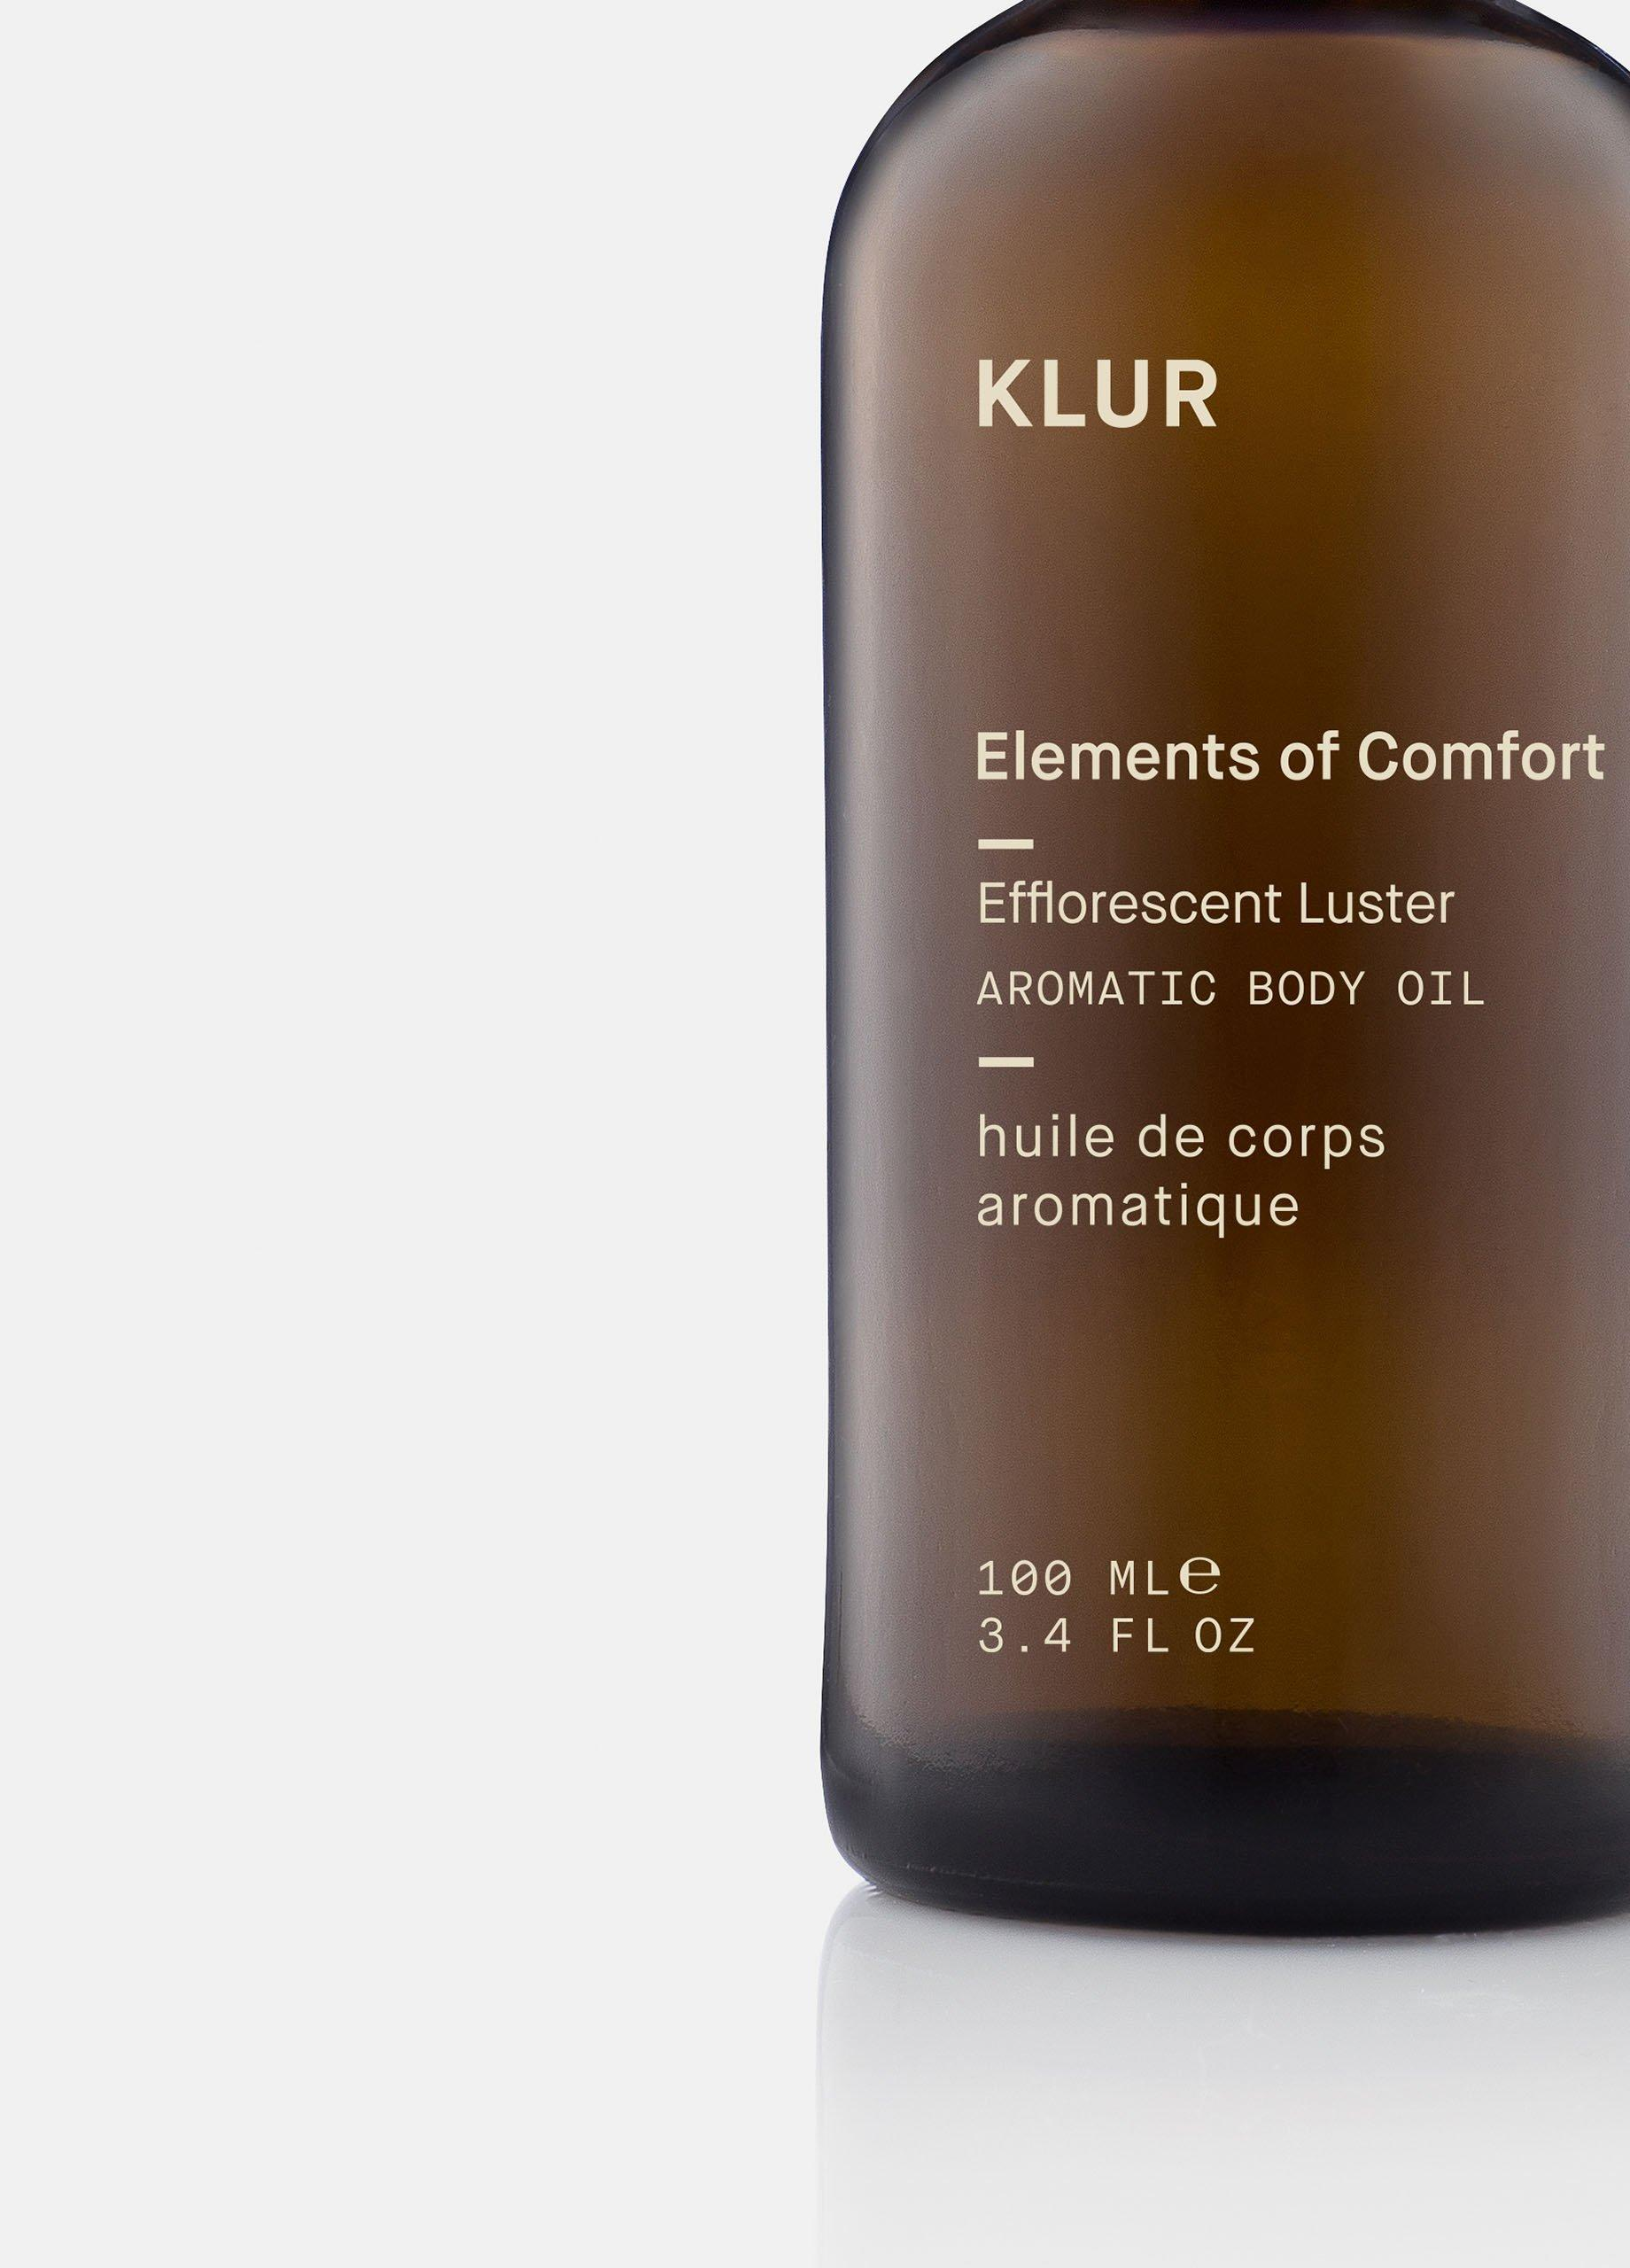 Klur / Elements of Comfort